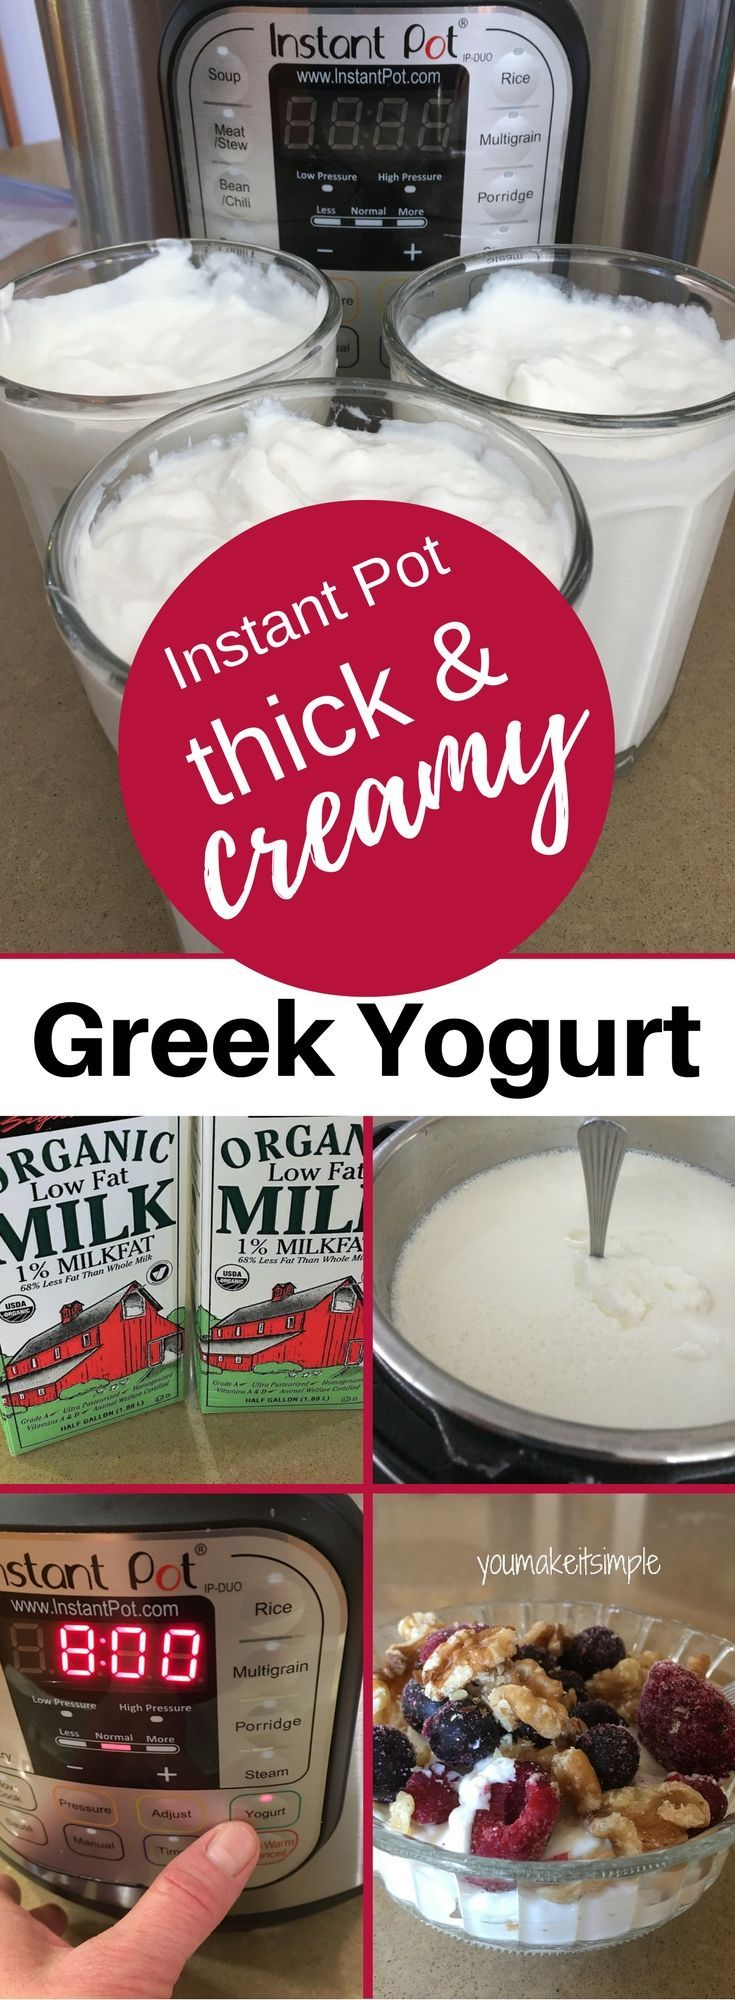 Instant Pot/Greek Yogurt/Easy & Yummy!